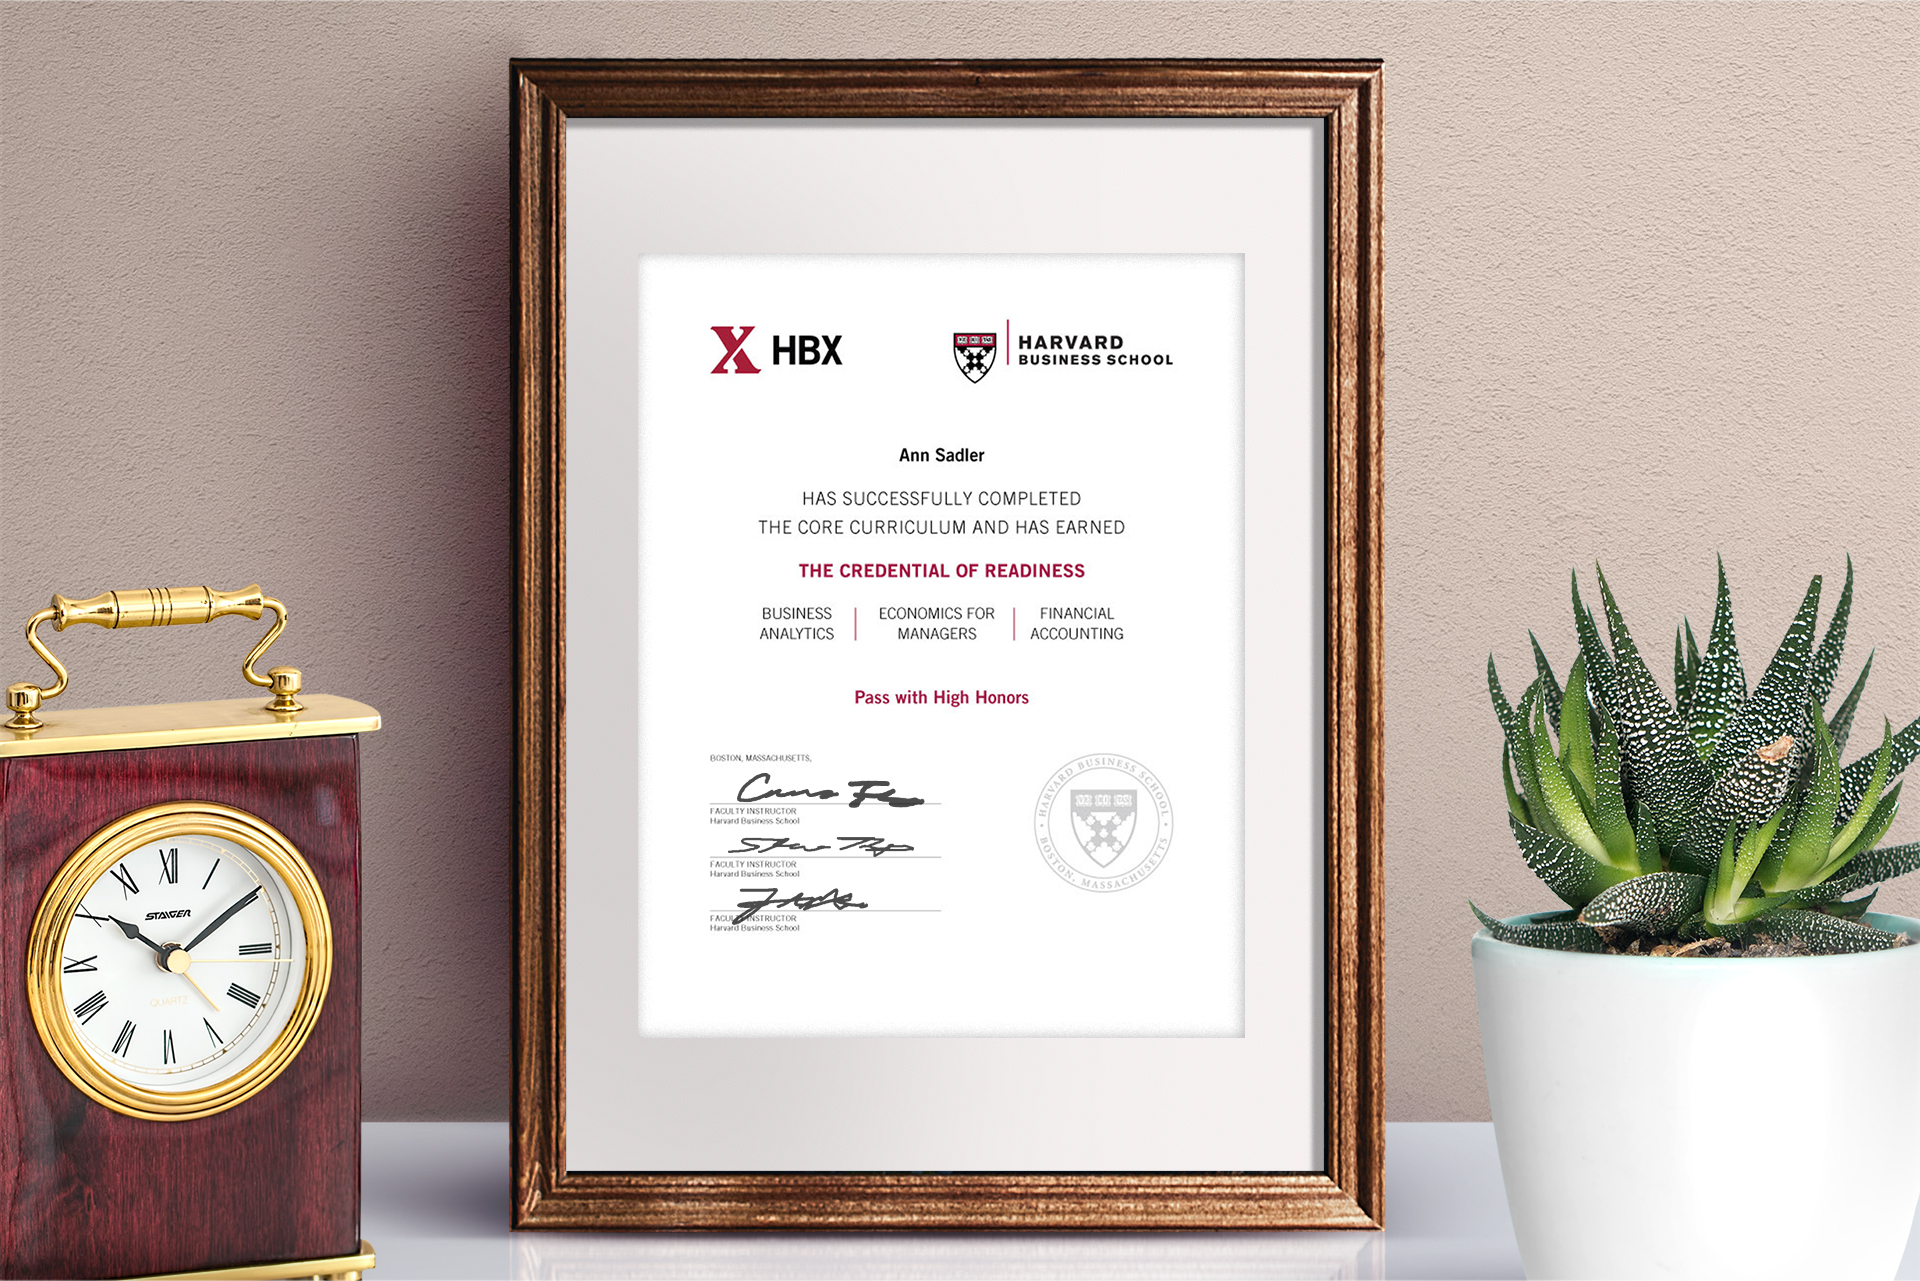 Online Course Business Fundamentals Harvard Business School Hbx